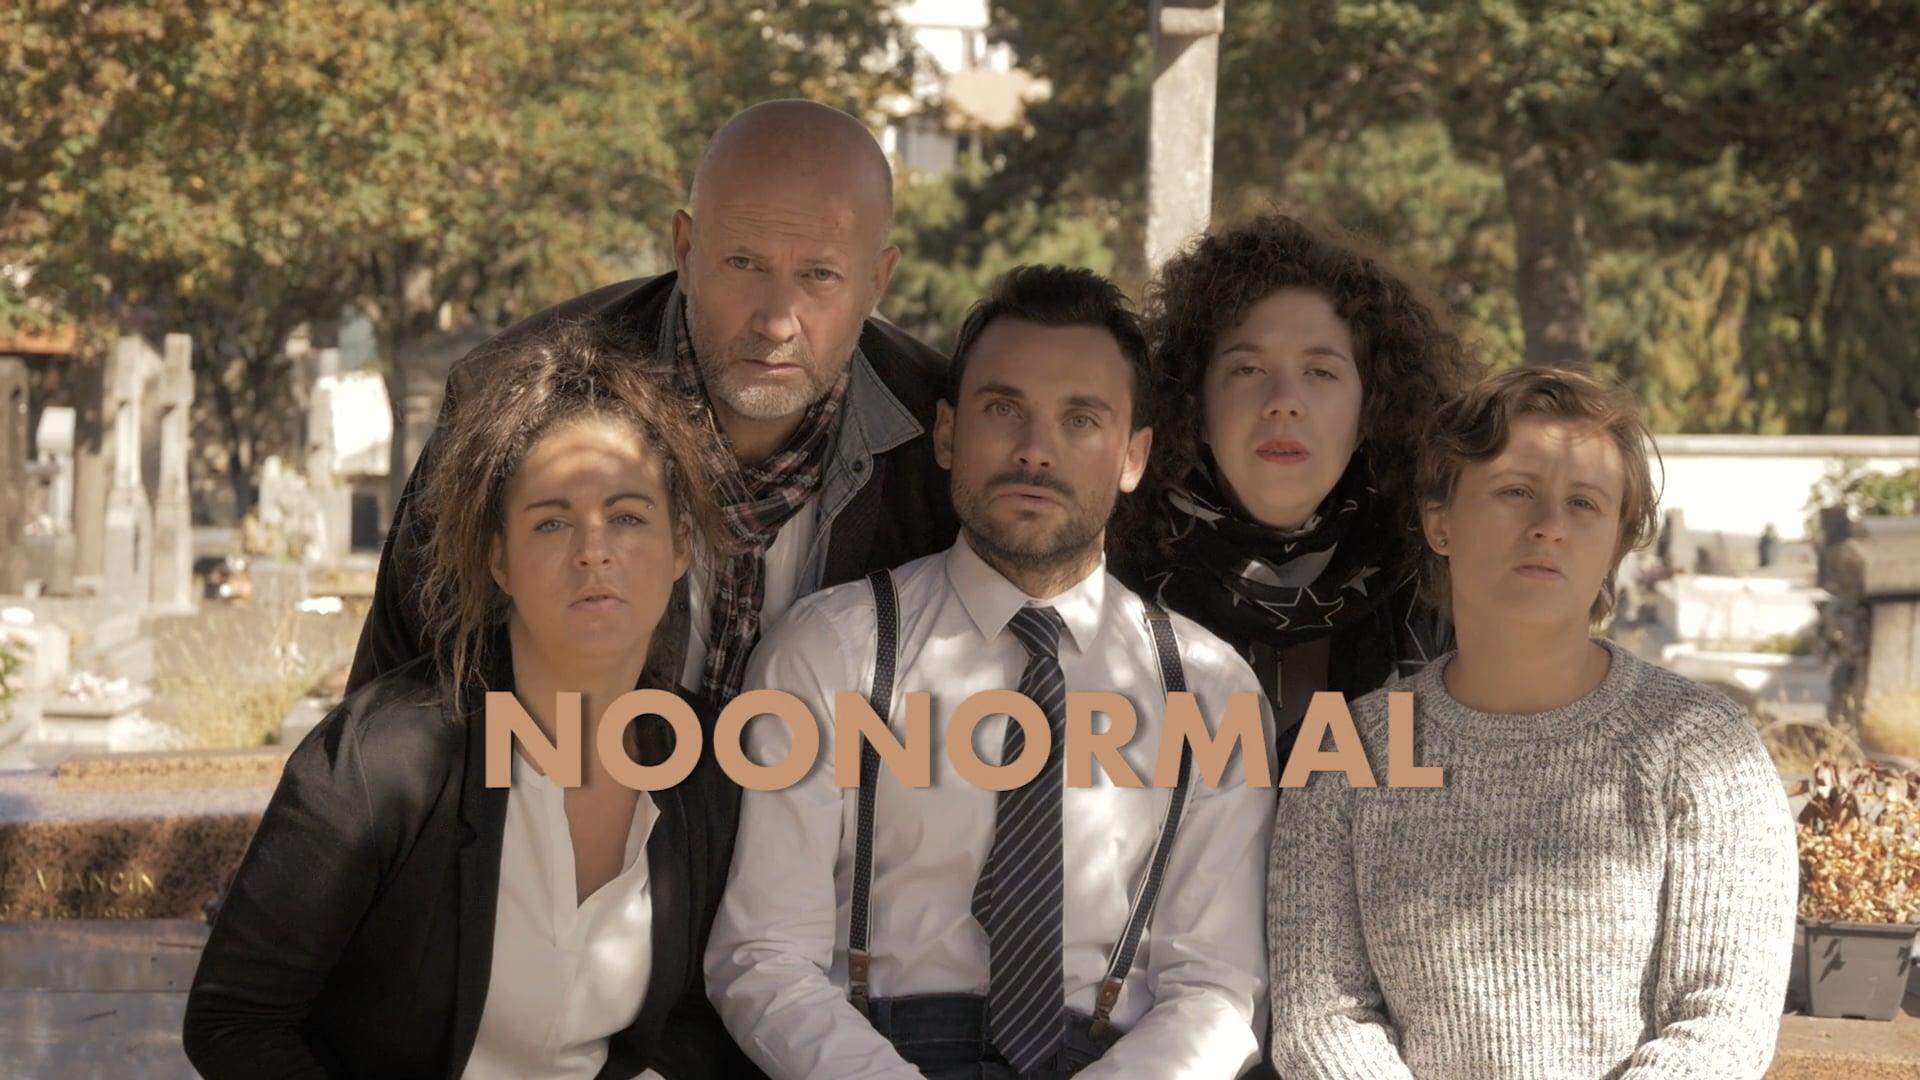 NOONORMAL